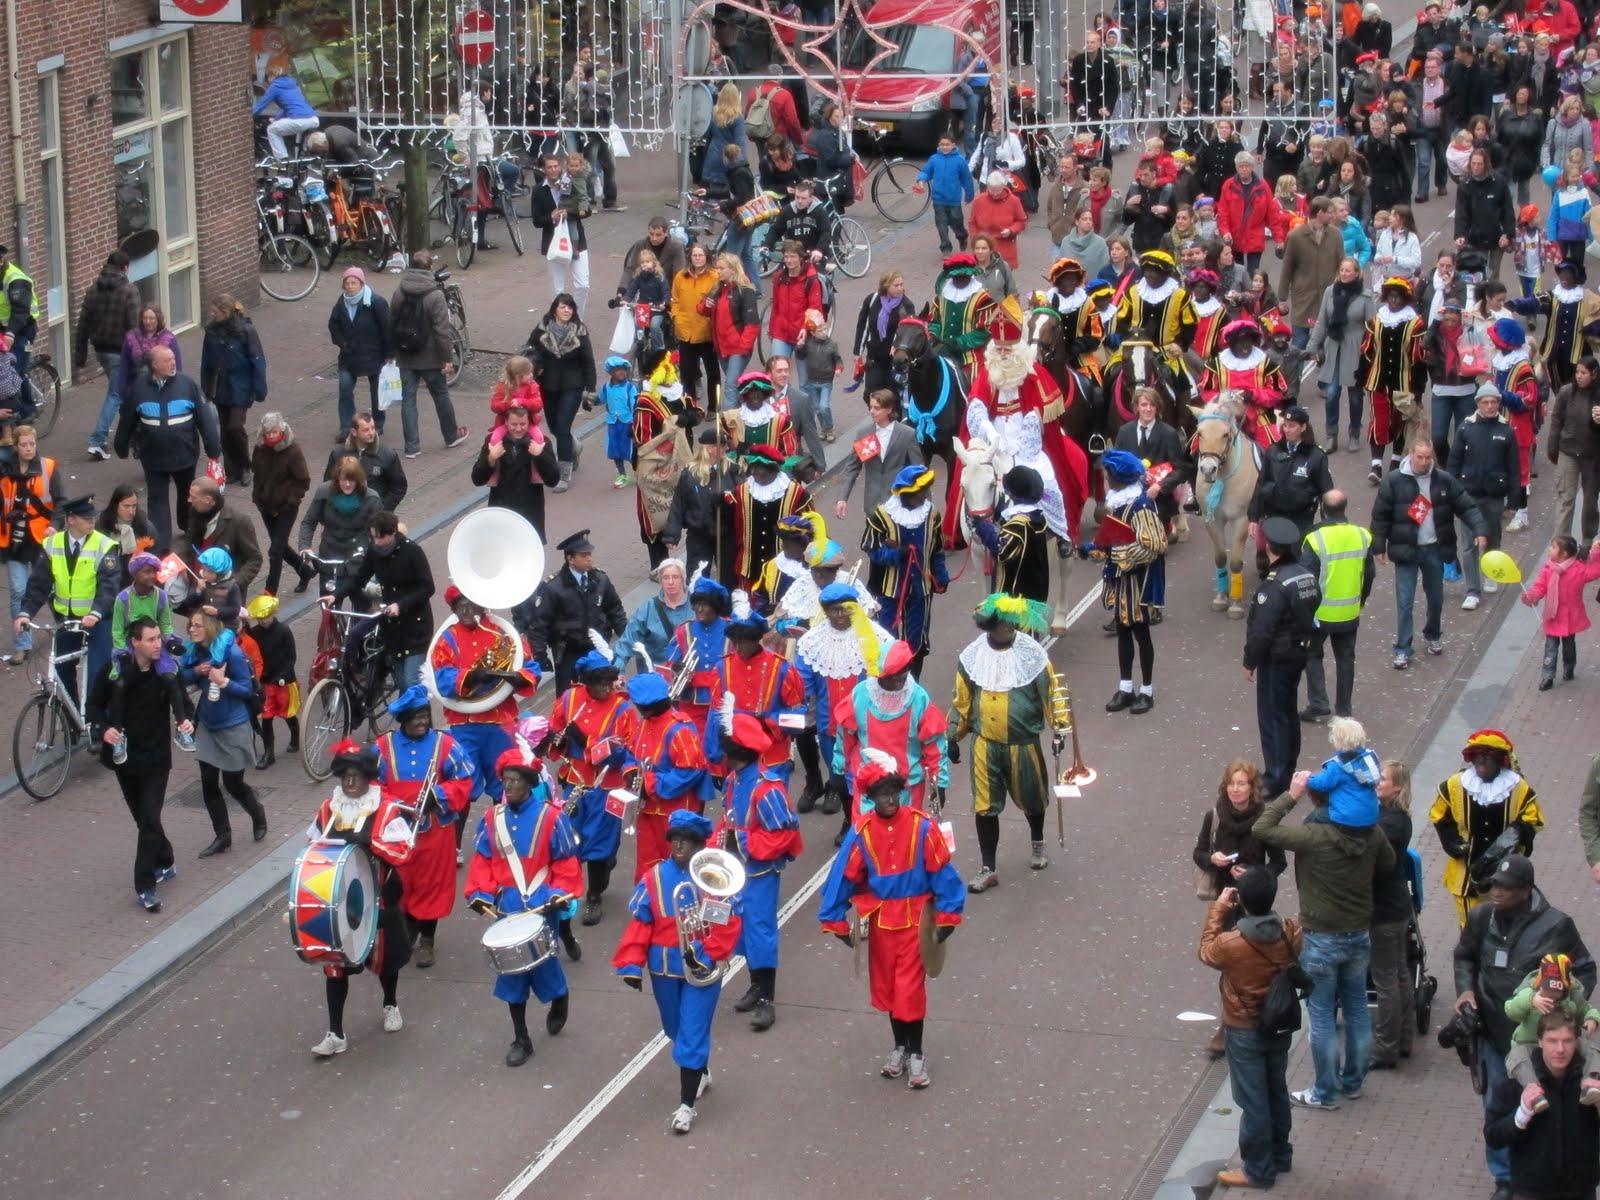 Sinterklaas Parade Video - A Wanderlust For Life